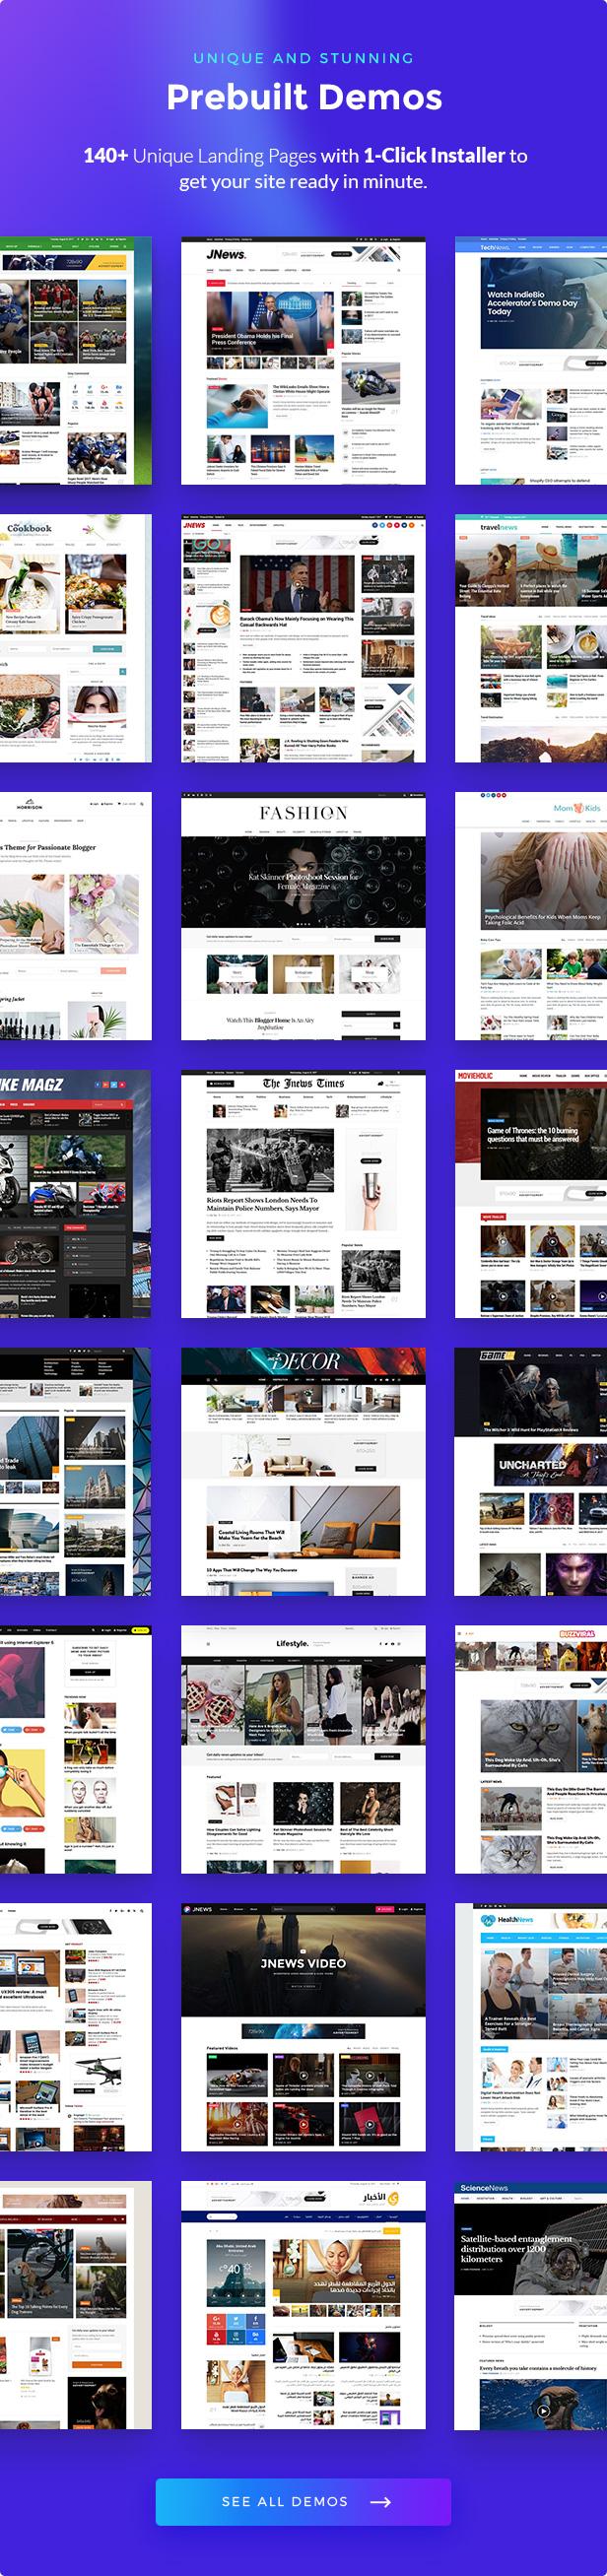 JNews - WordPress Newspaper Magazine Blog AMP Theme - 26